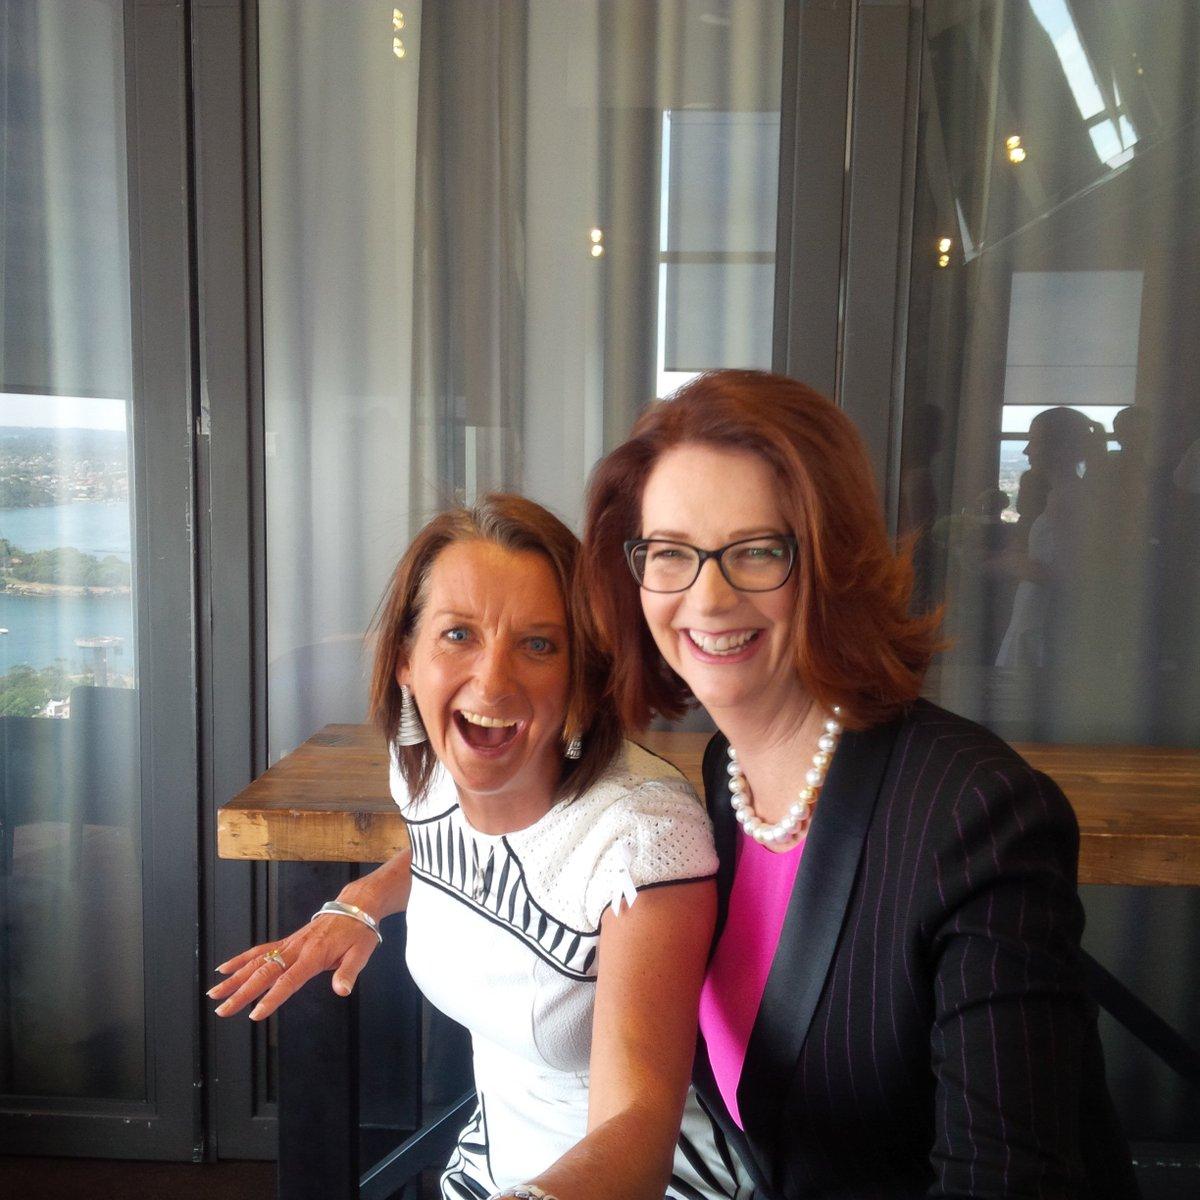 Selfie Julia Gillard nude photos 2019